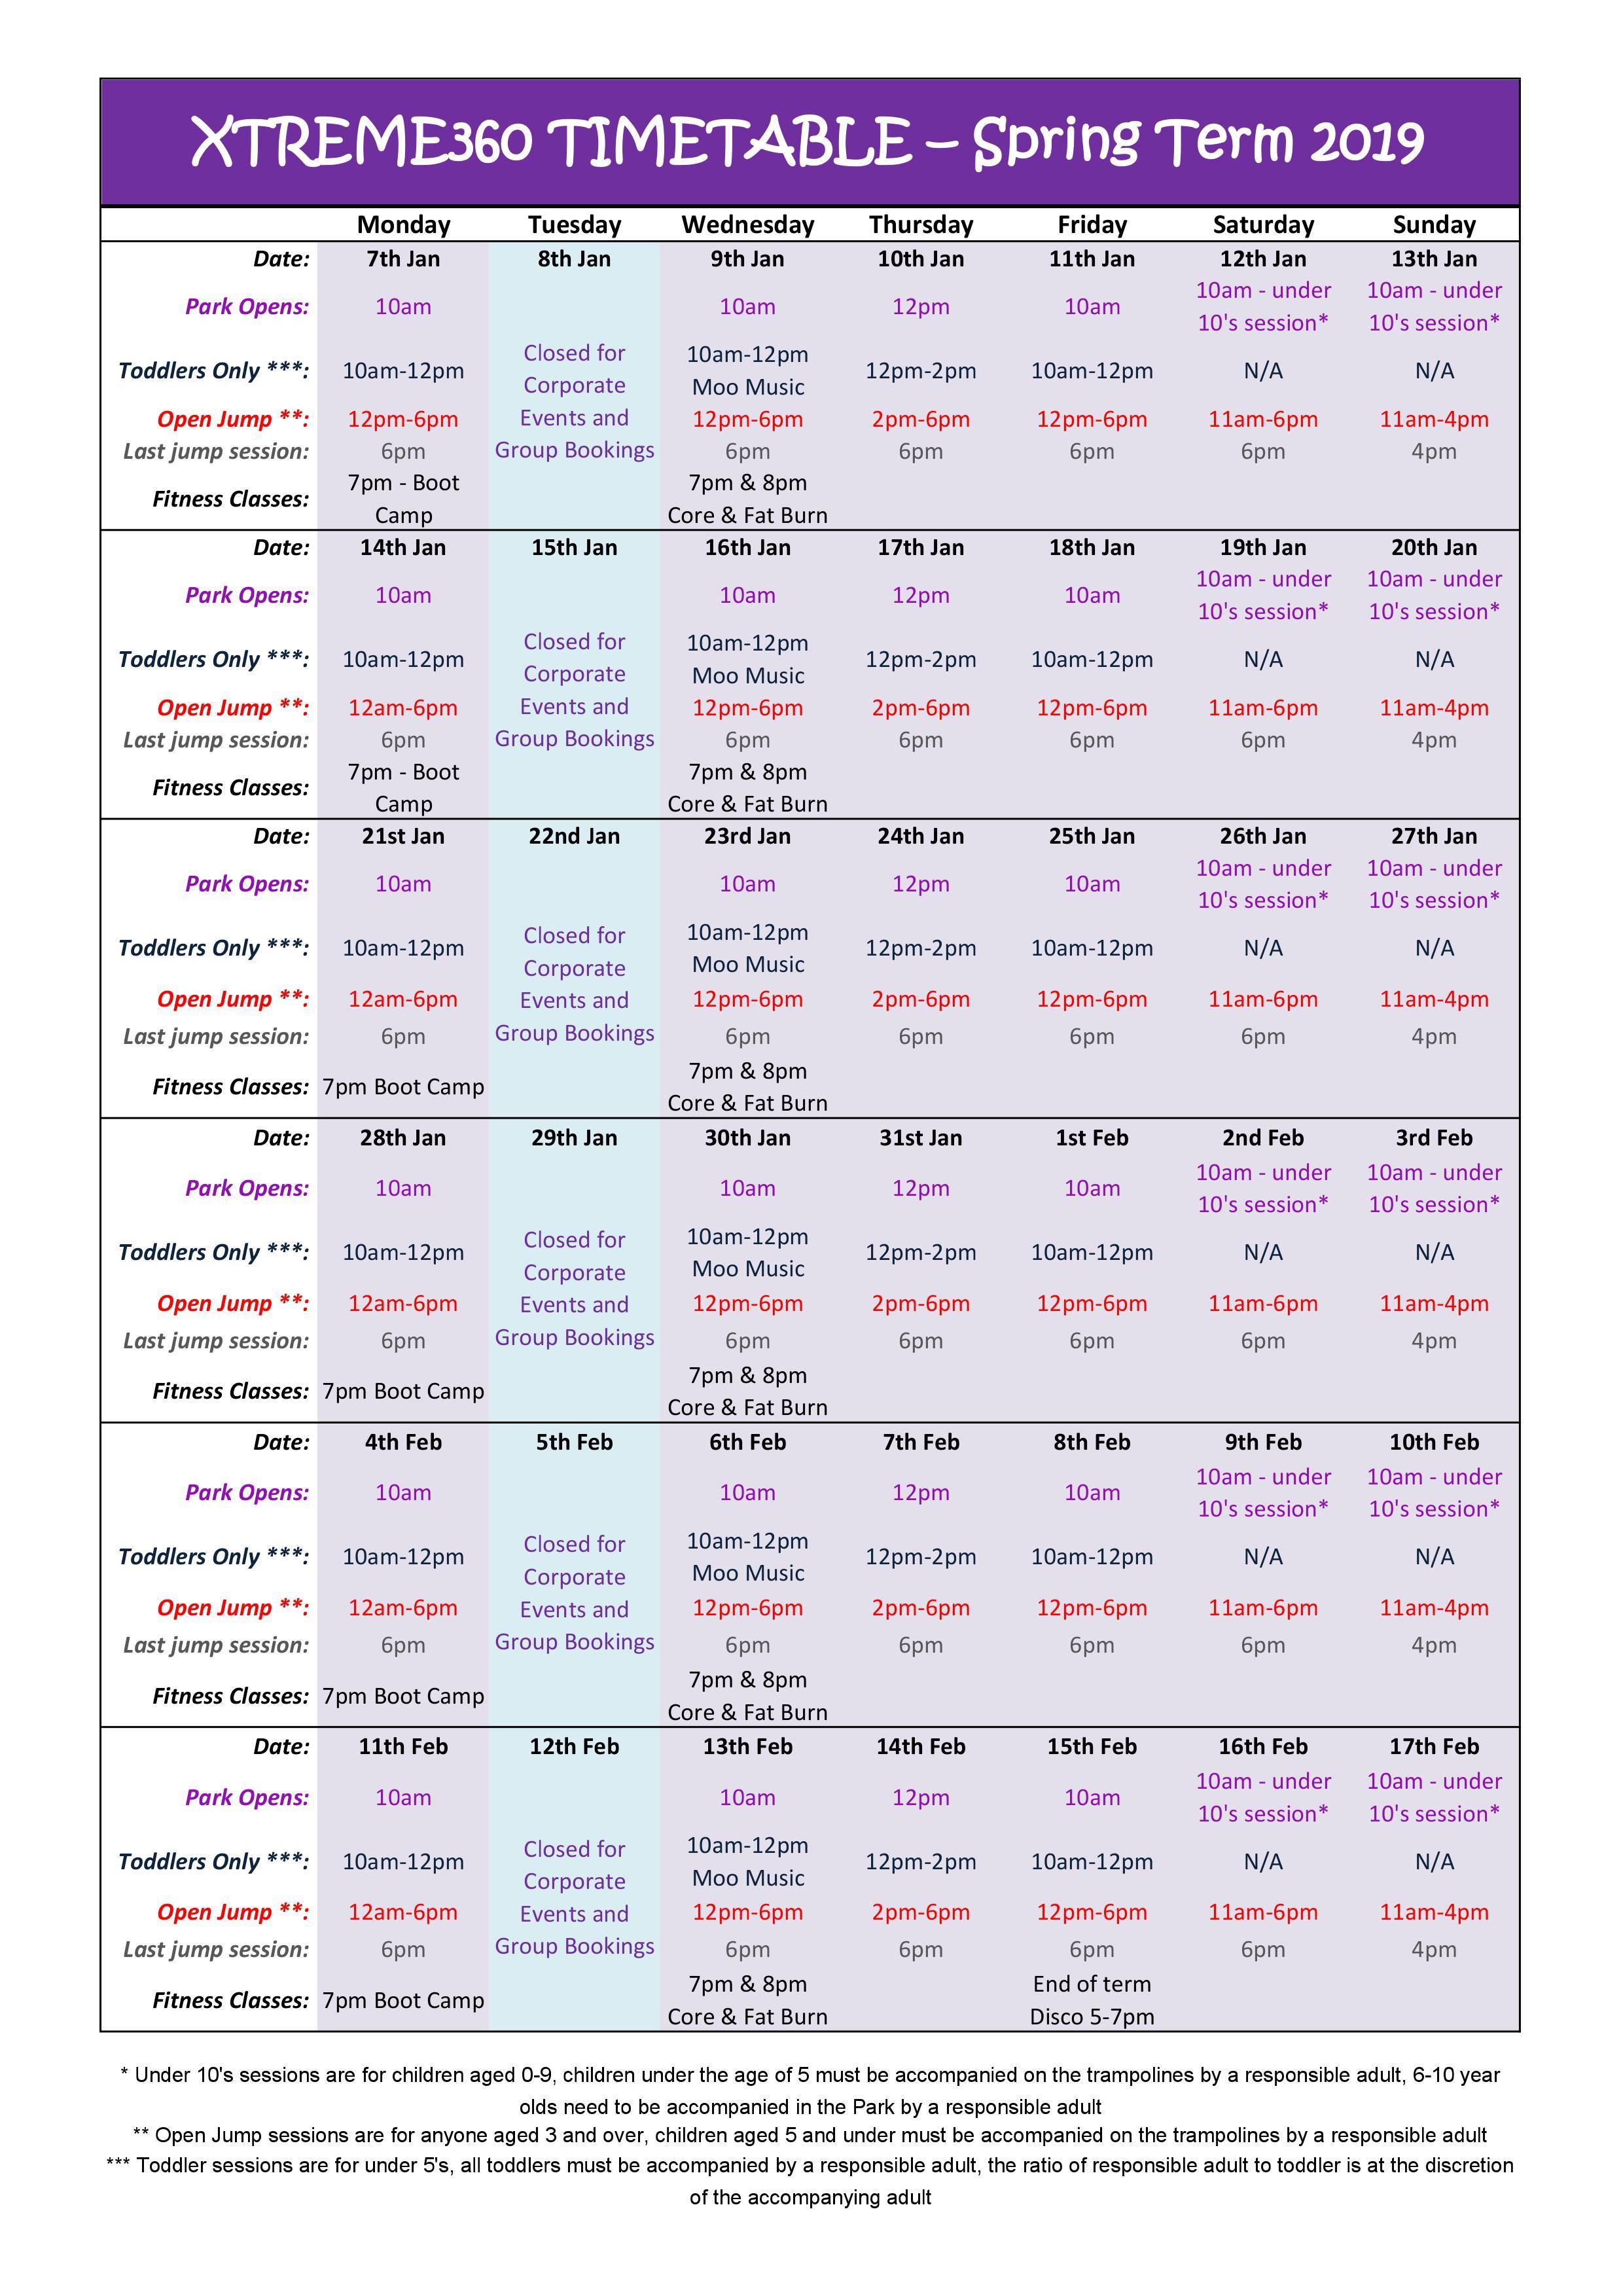 Xtreme360 Timetable Spring Term 2019